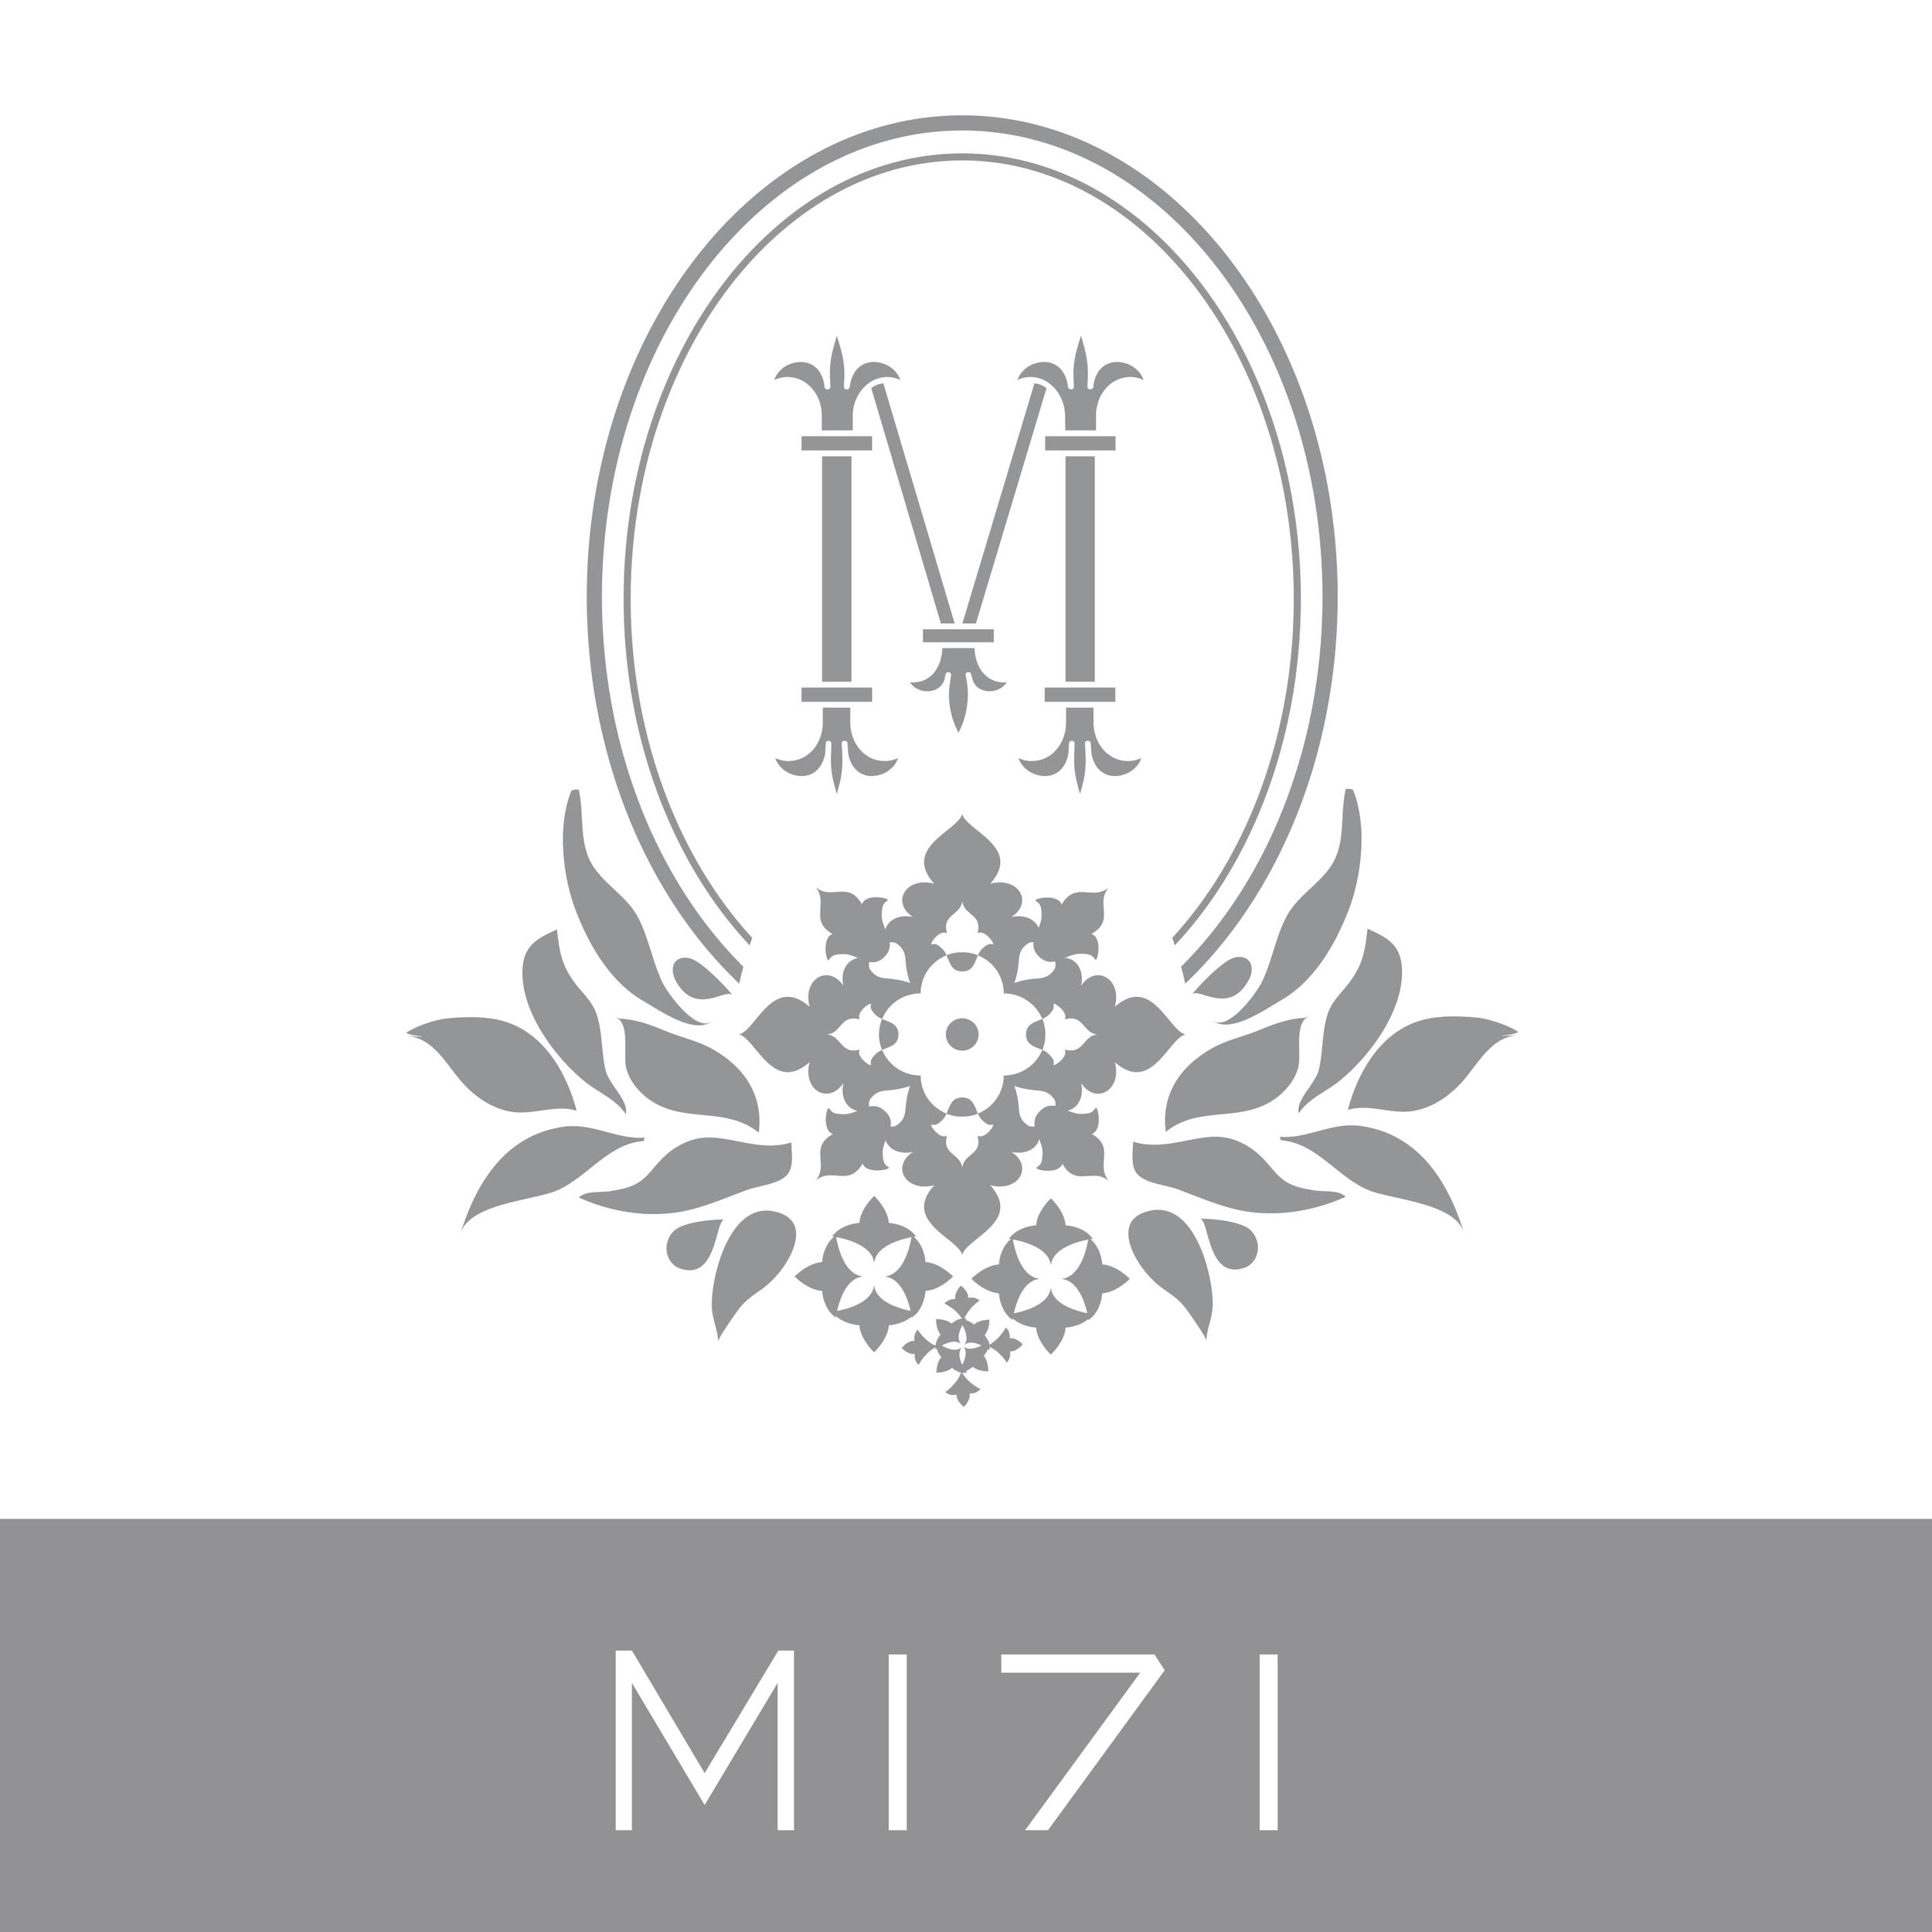 M171.jpg